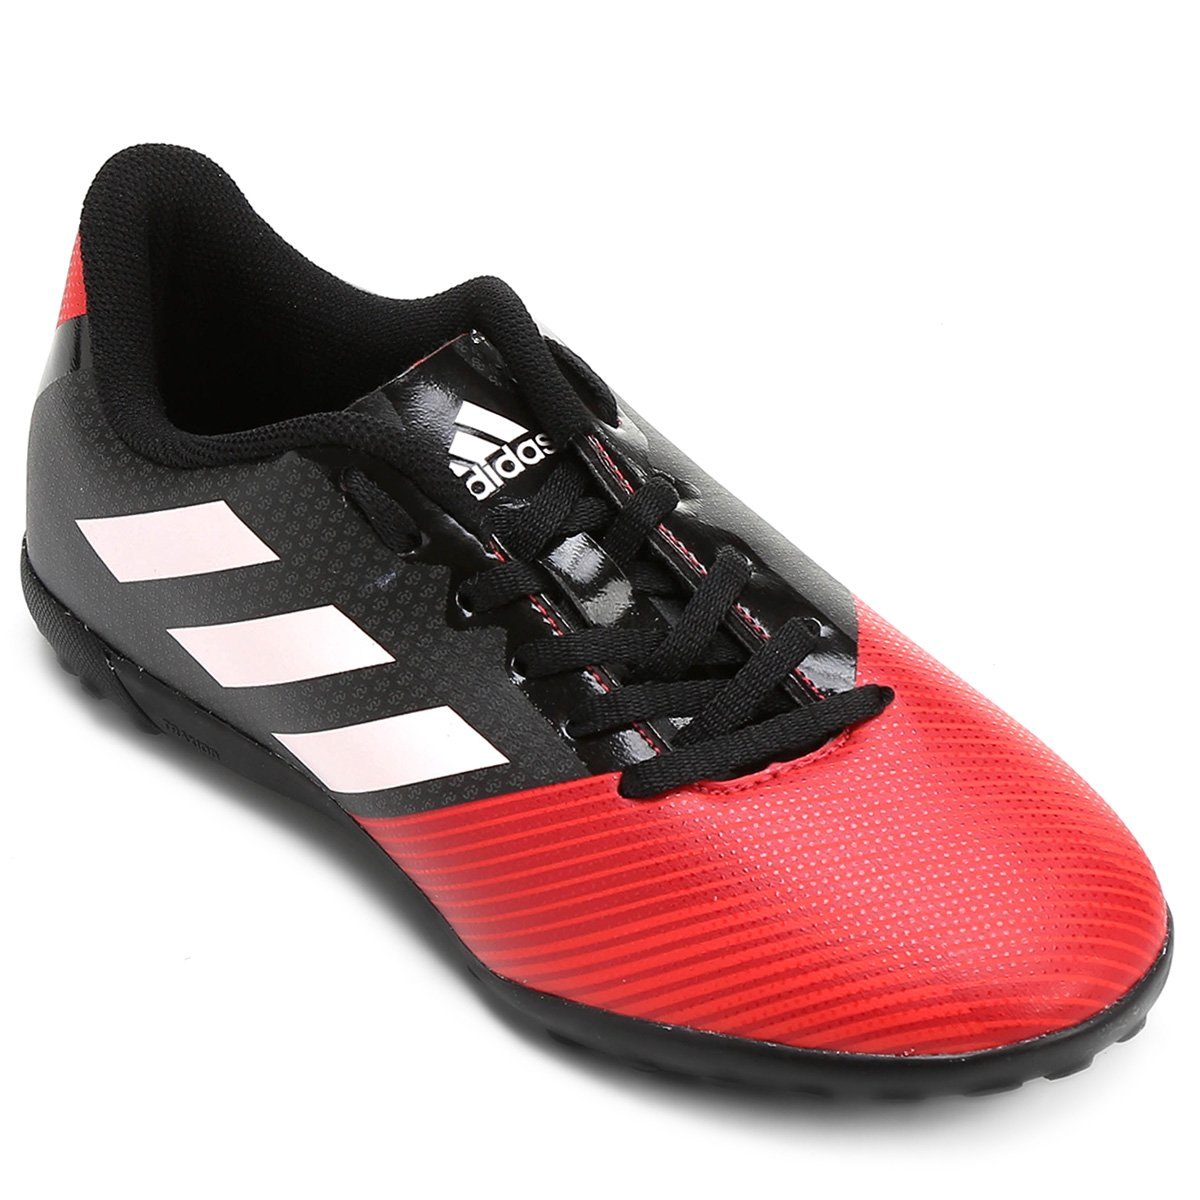 fd08c4fb75 Chuteira Society Juvenil Adidas Artilheira 17 TF